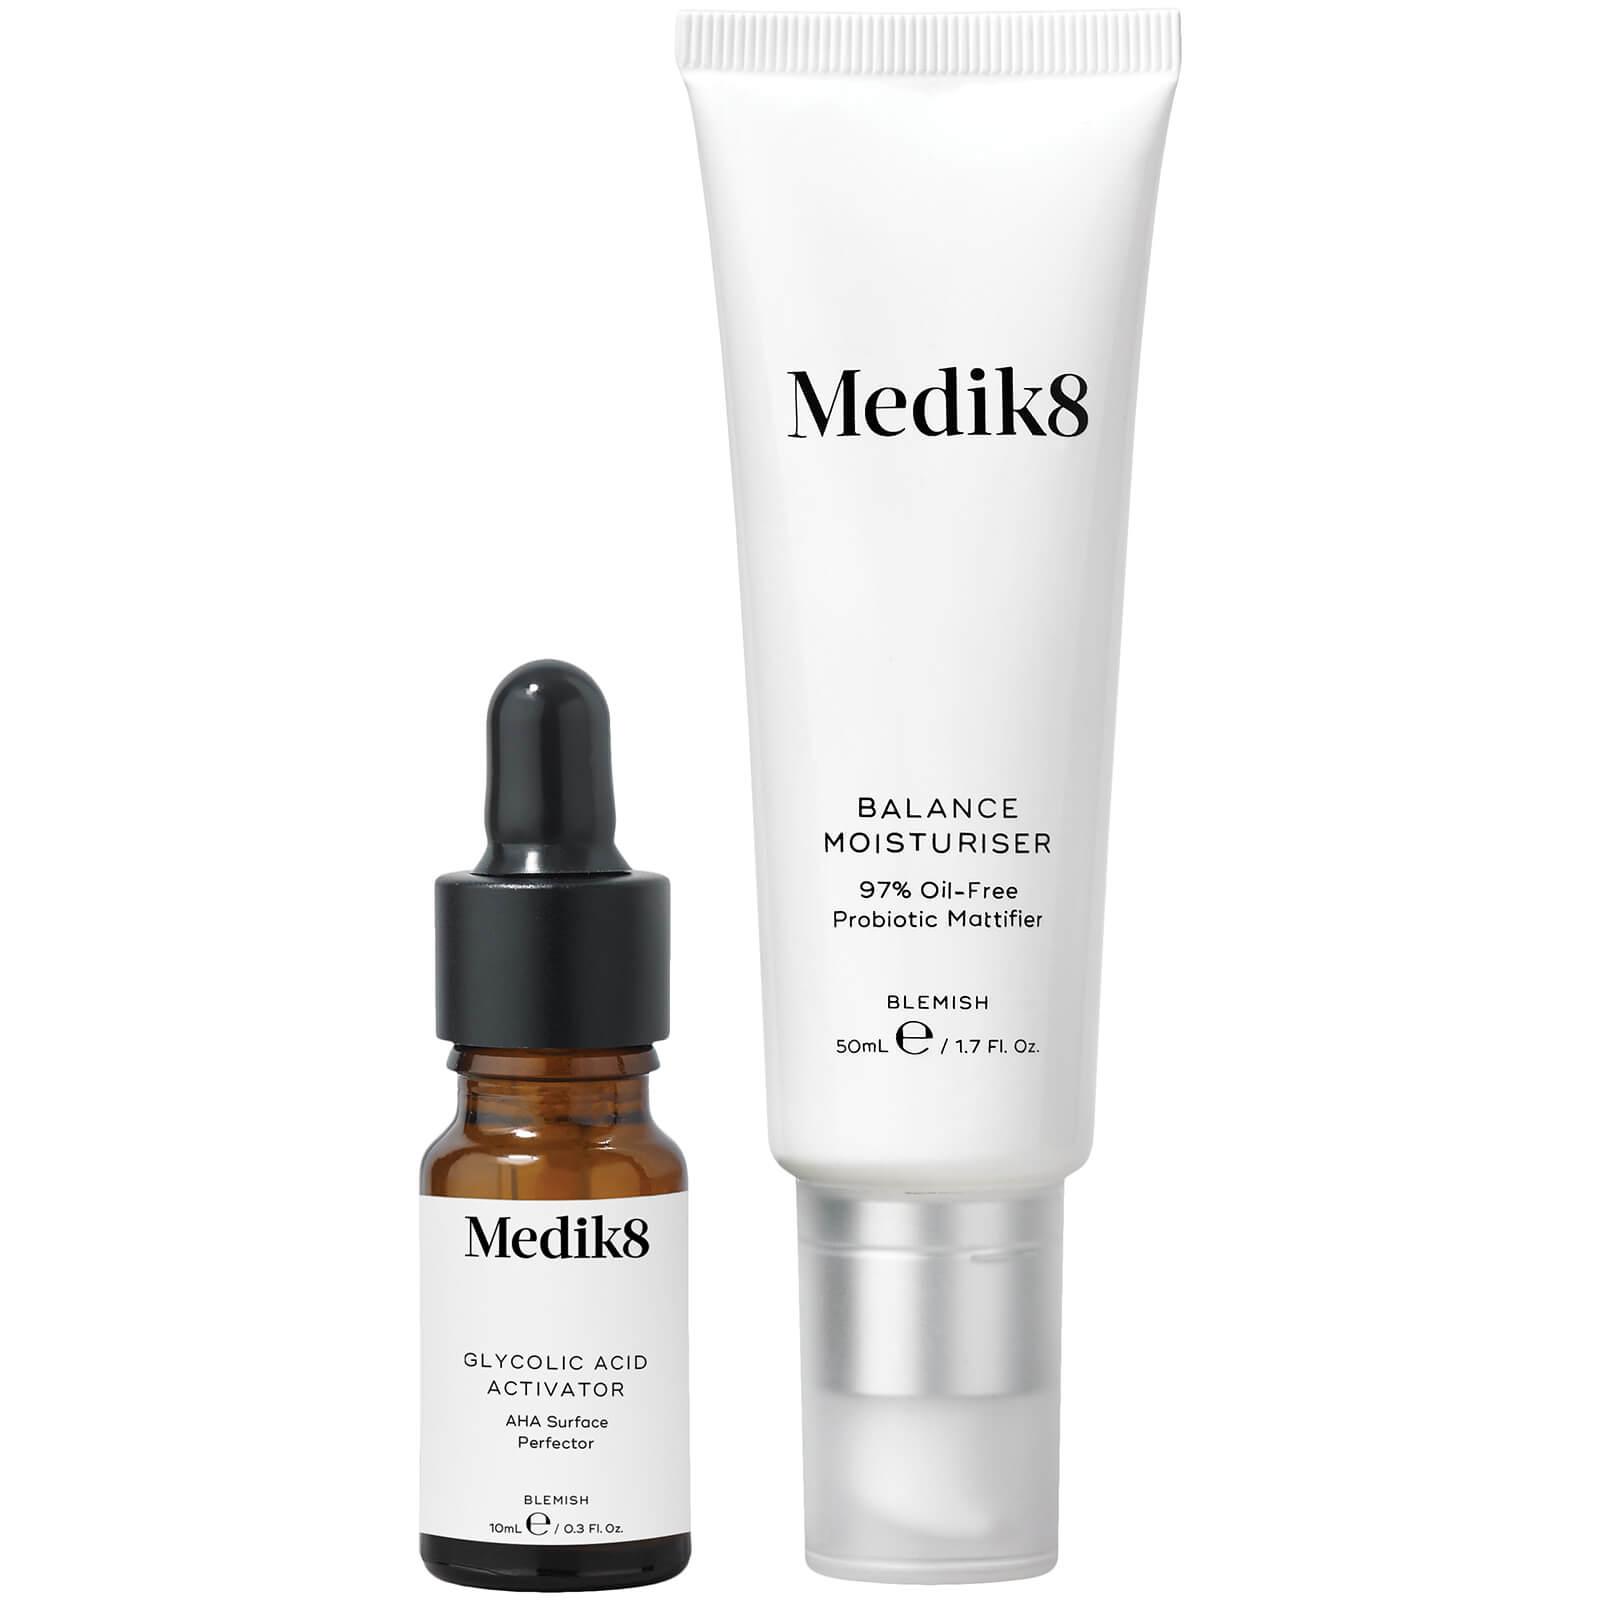 Medik8 Balance Moisturiser with Glycolic Acid Activator 50ml